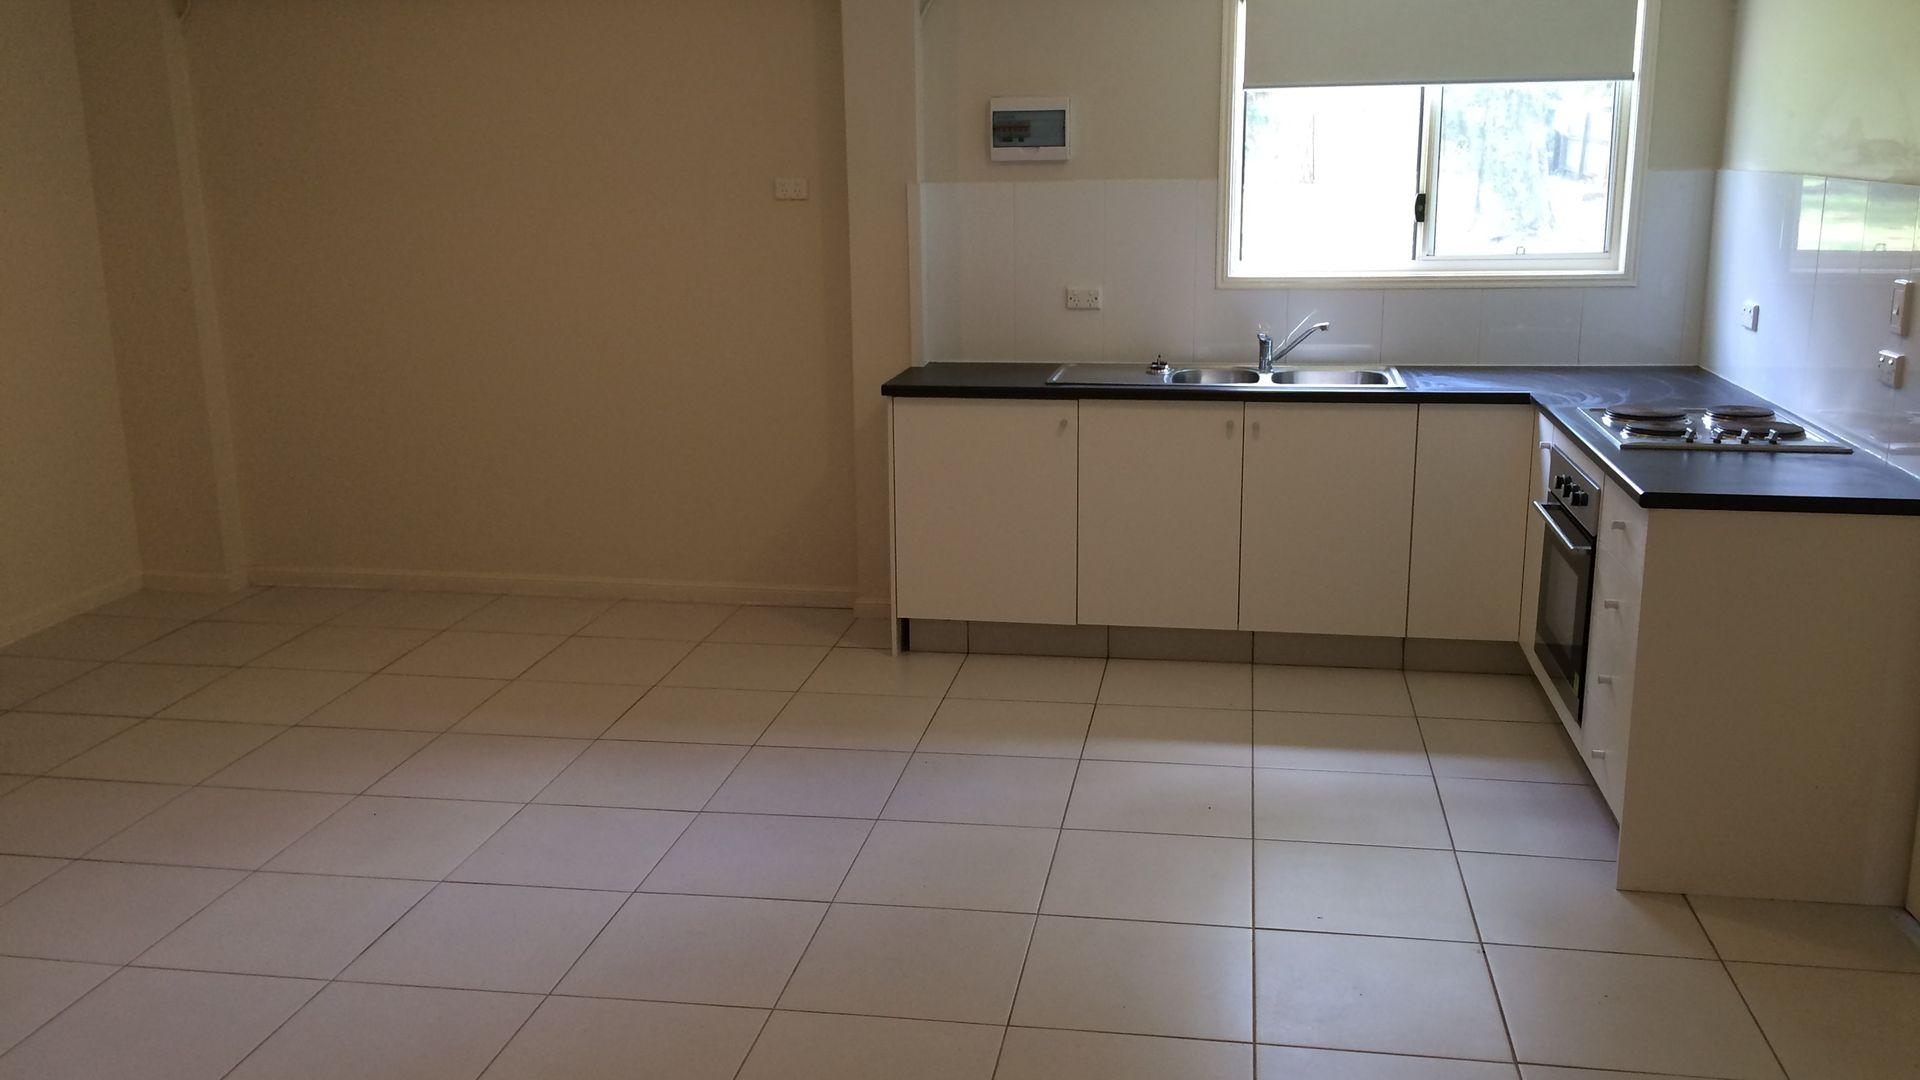 27 Pauline St, Marsden QLD 4132, Image 1